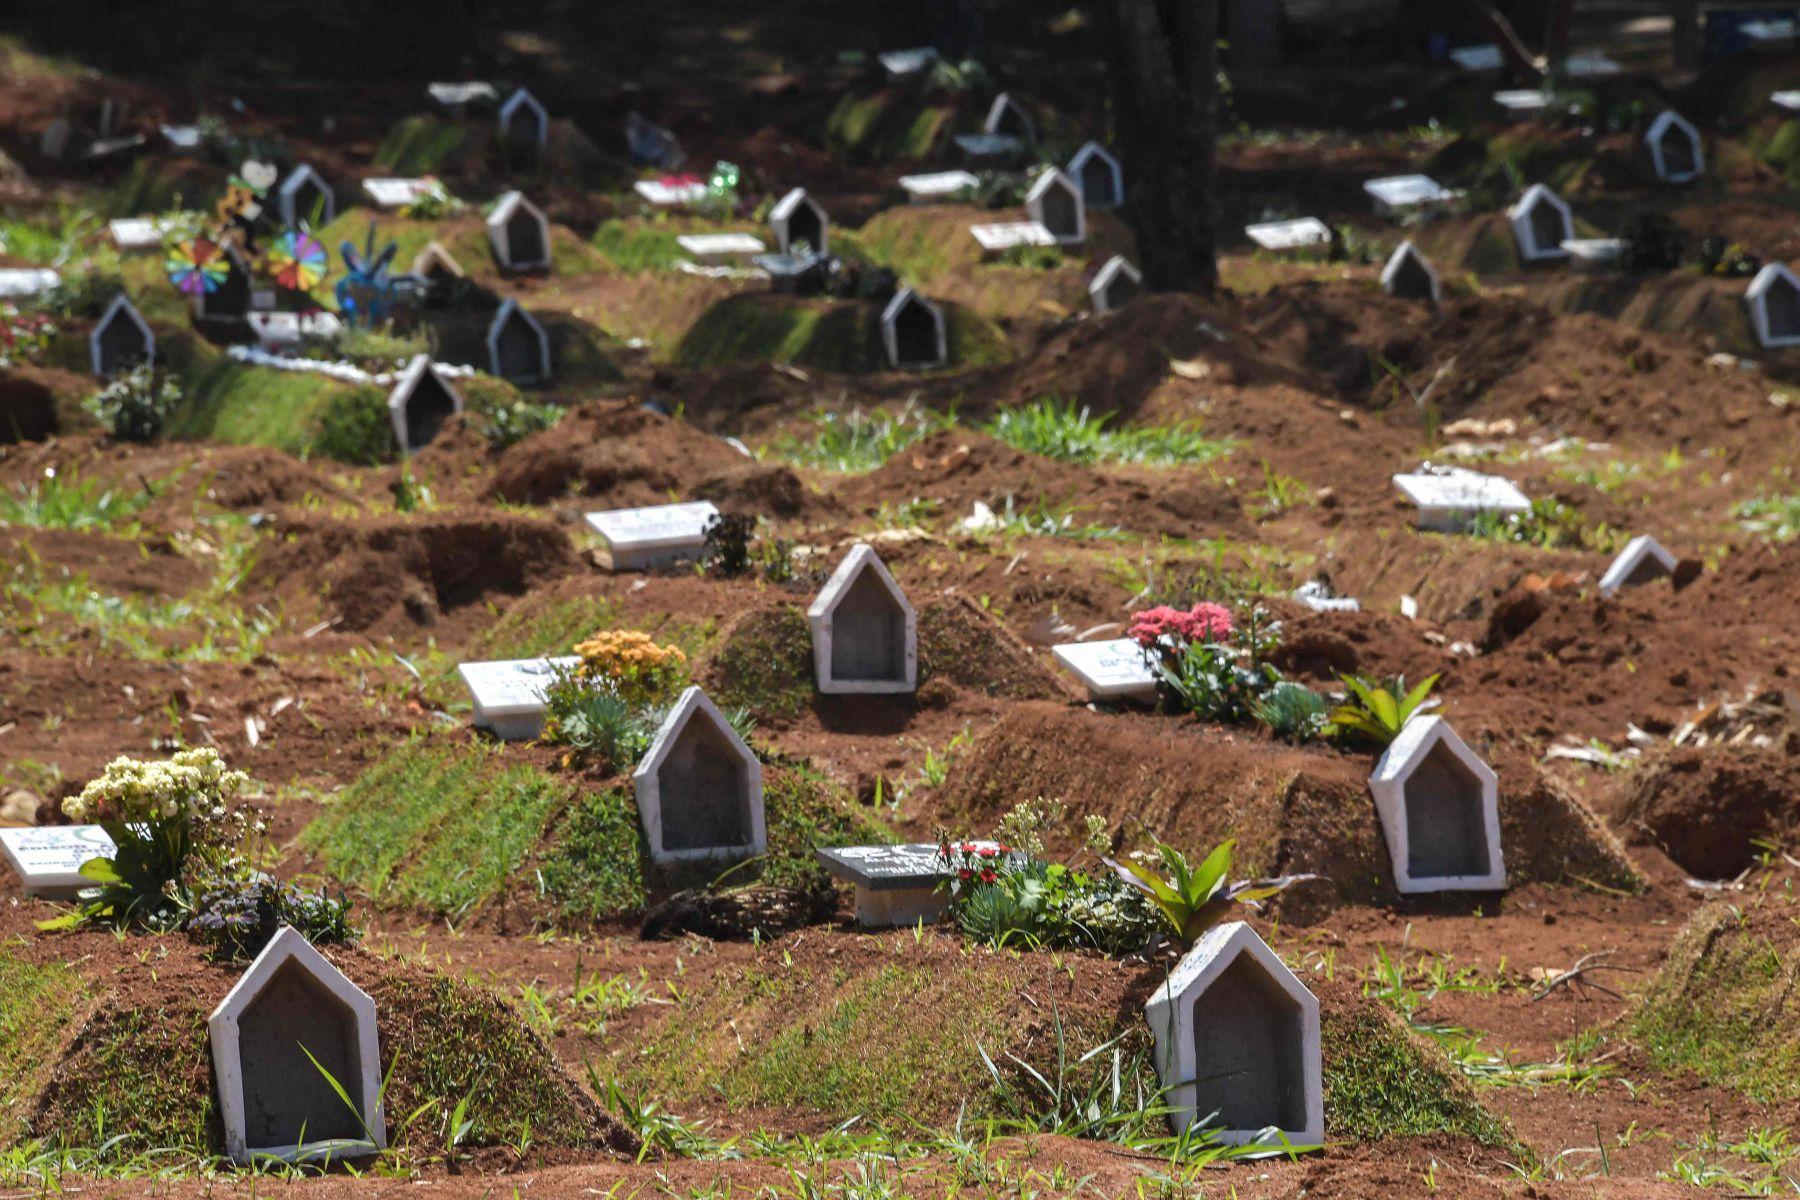 AFP/NELSON ALMEIDA